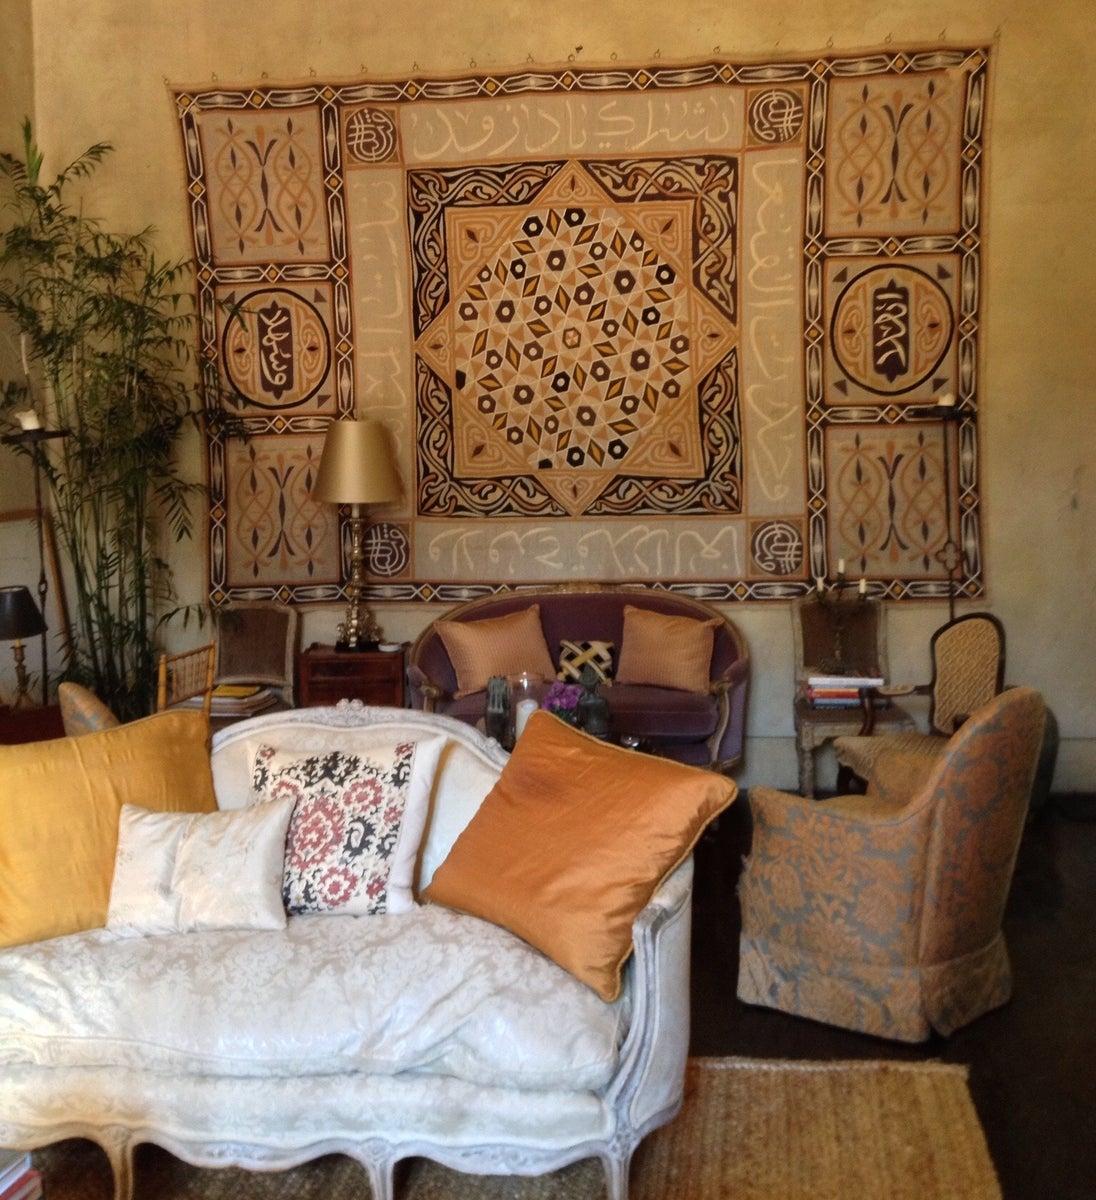 Arte Design In Los Angeles Images: Villa Vallombrosa By Annie Kelly Art + Design